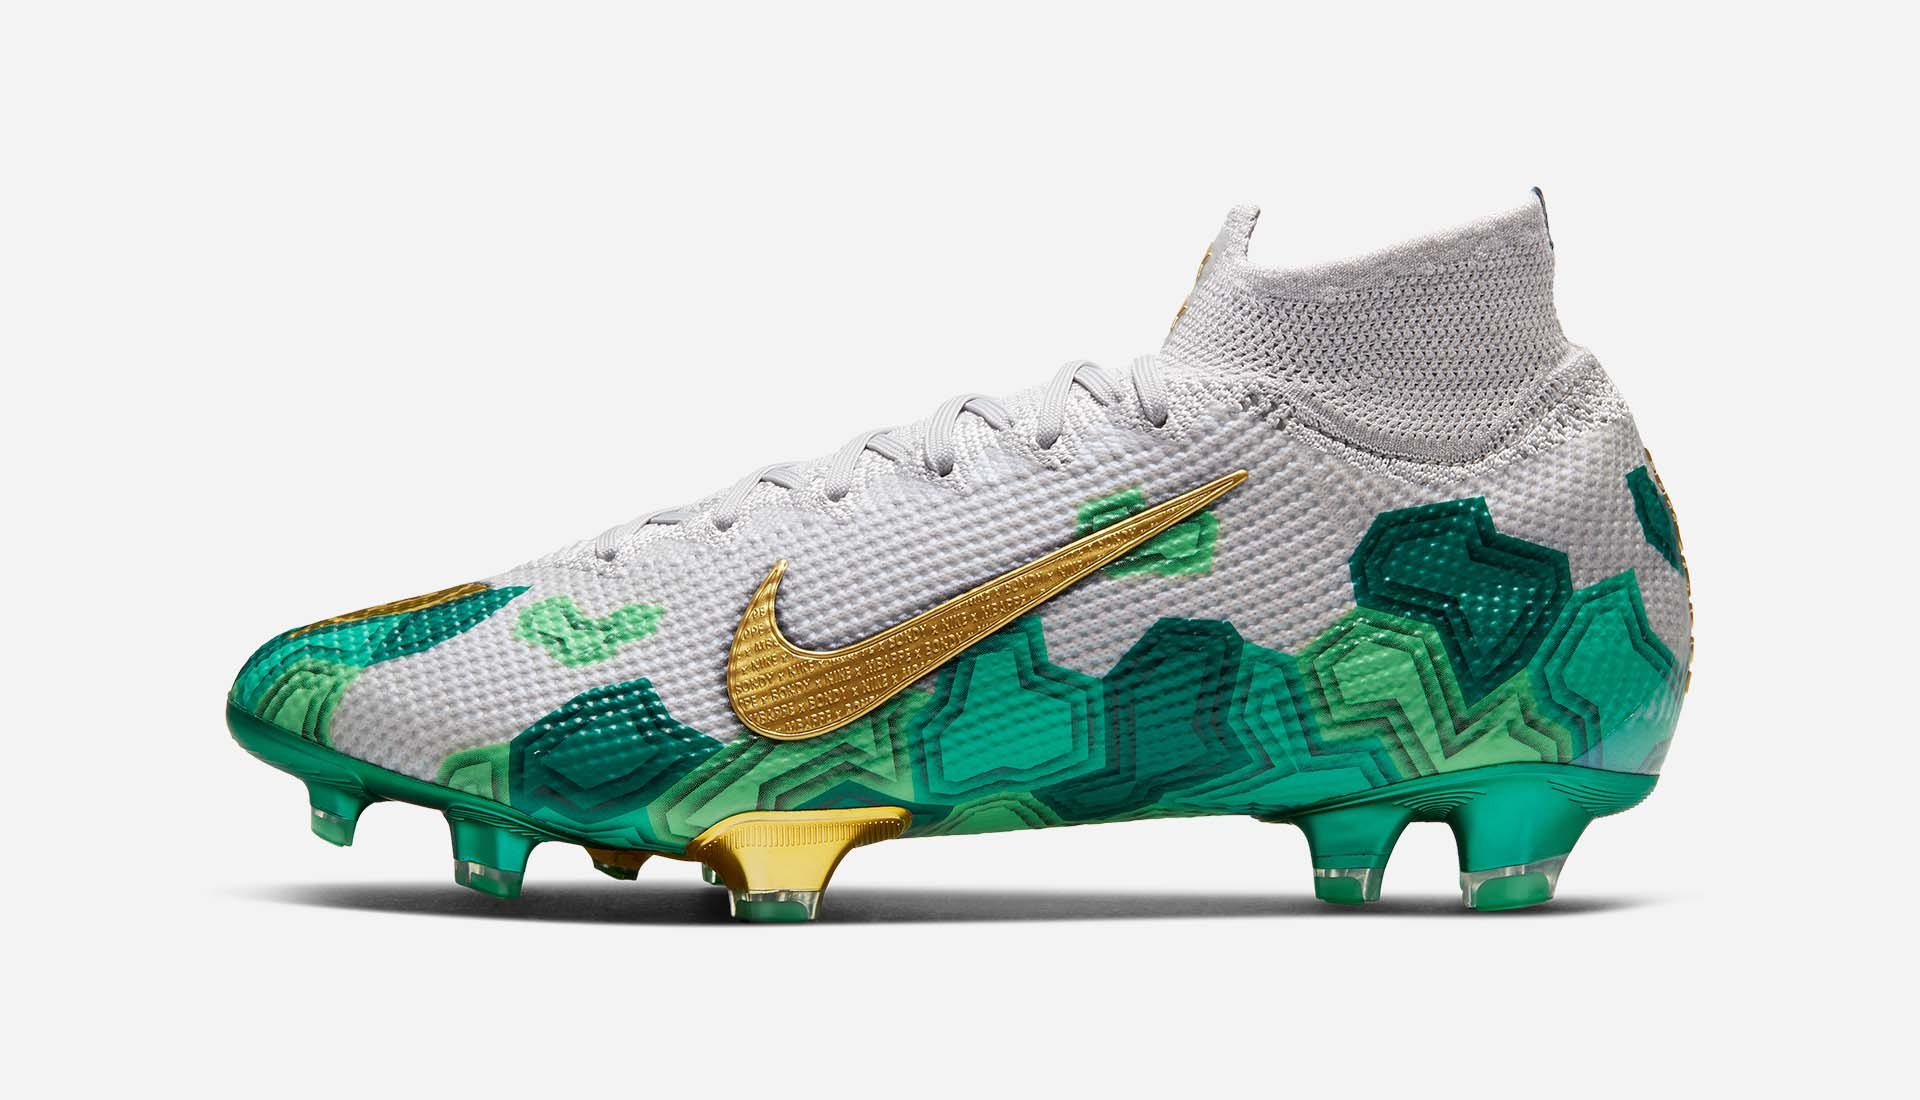 Nike Launch Kylian Mbappé's First